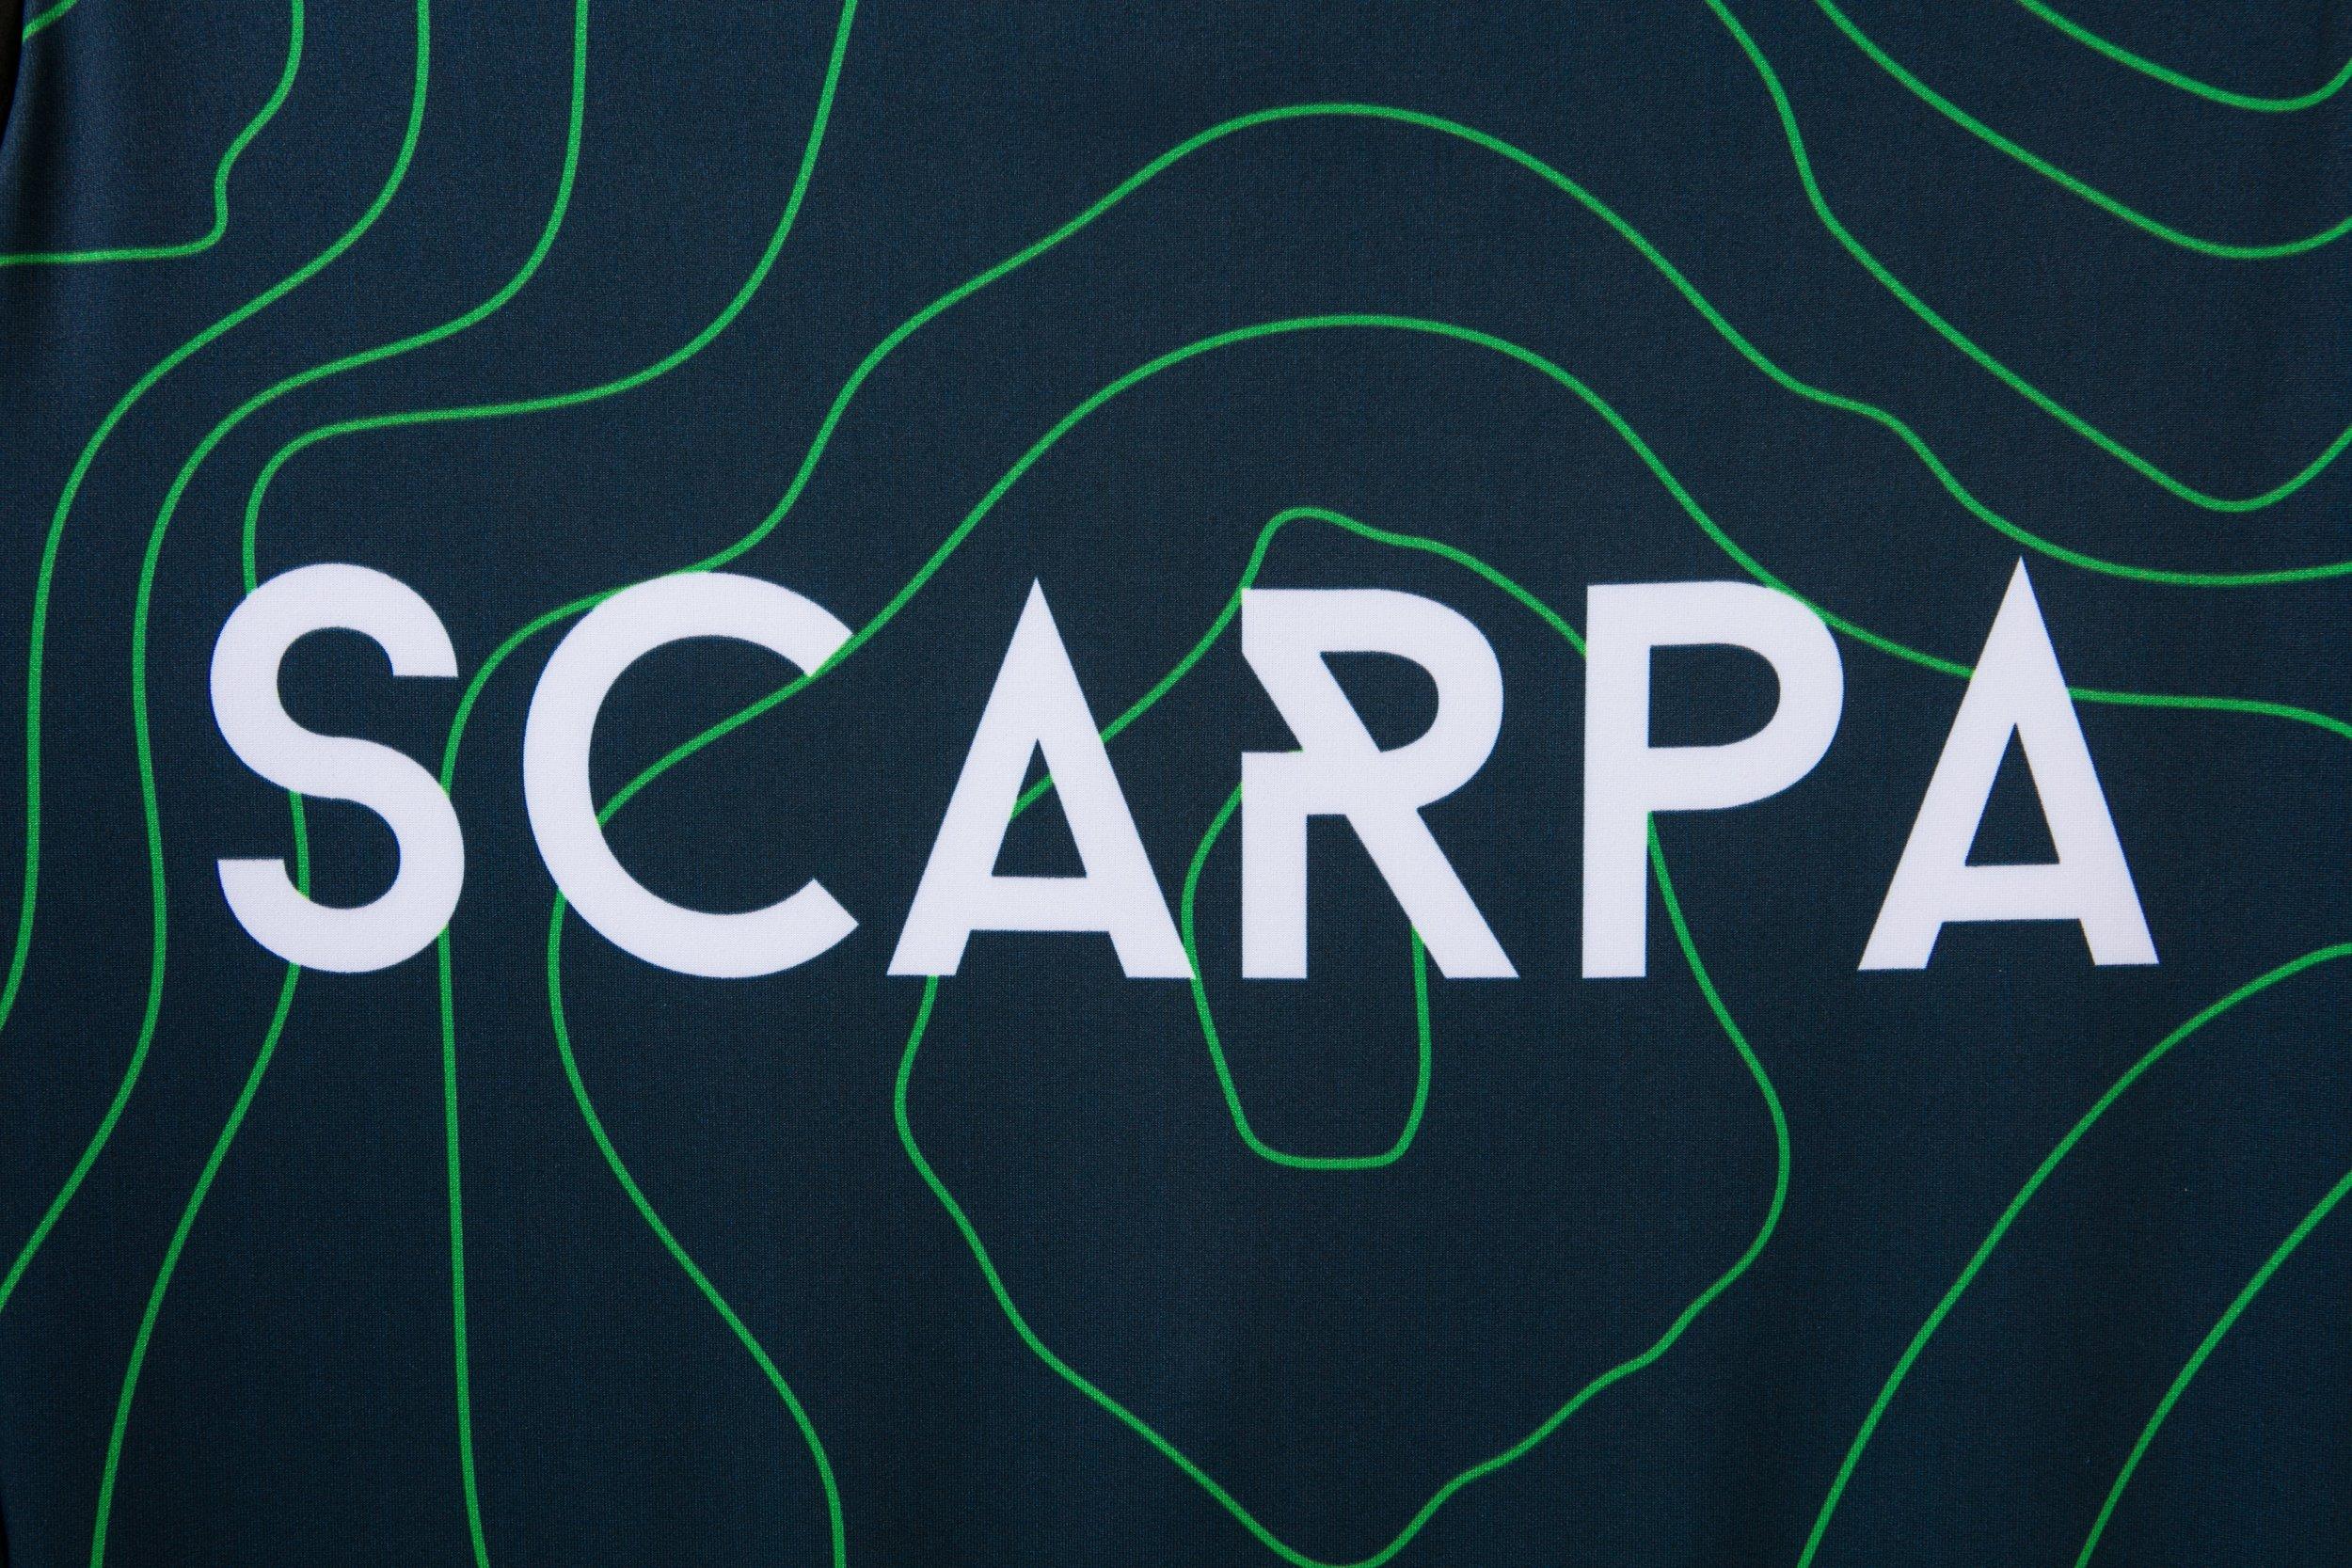 XX_H1-18_Custom_Scarpa_Macro-Detail_3.jpg